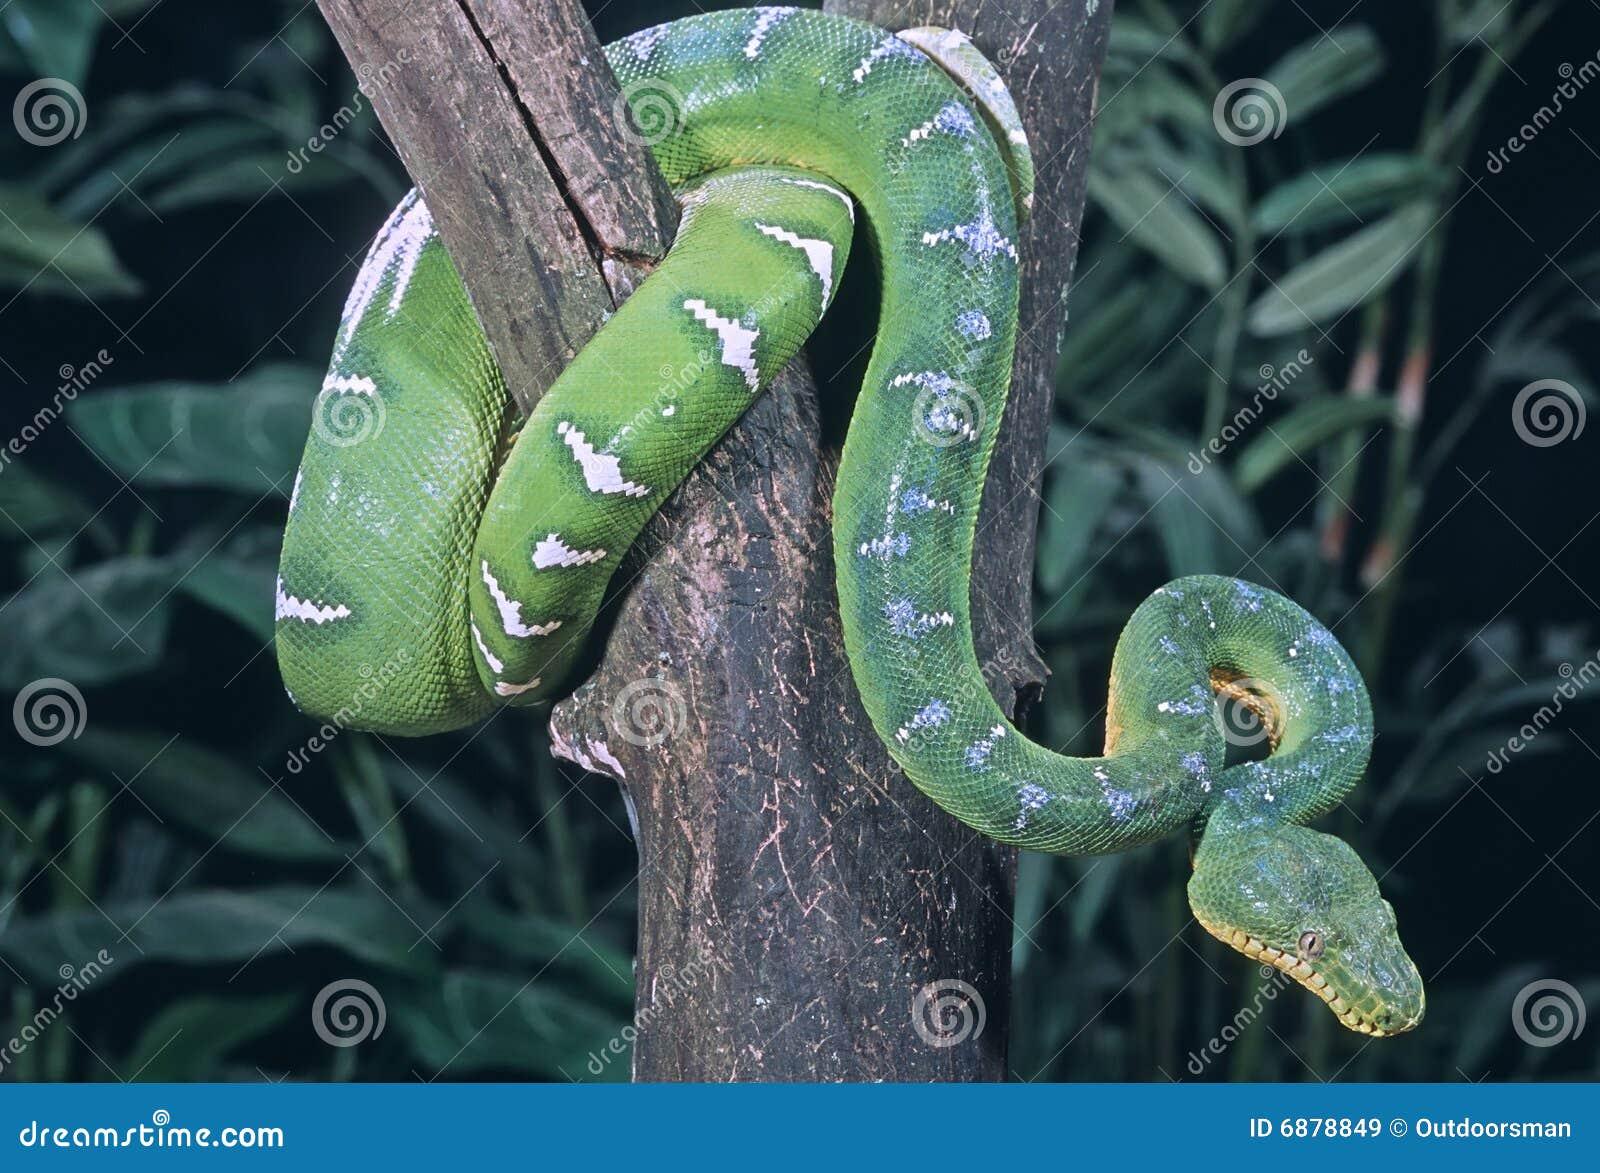 Image Result For Emerald Tree Boa